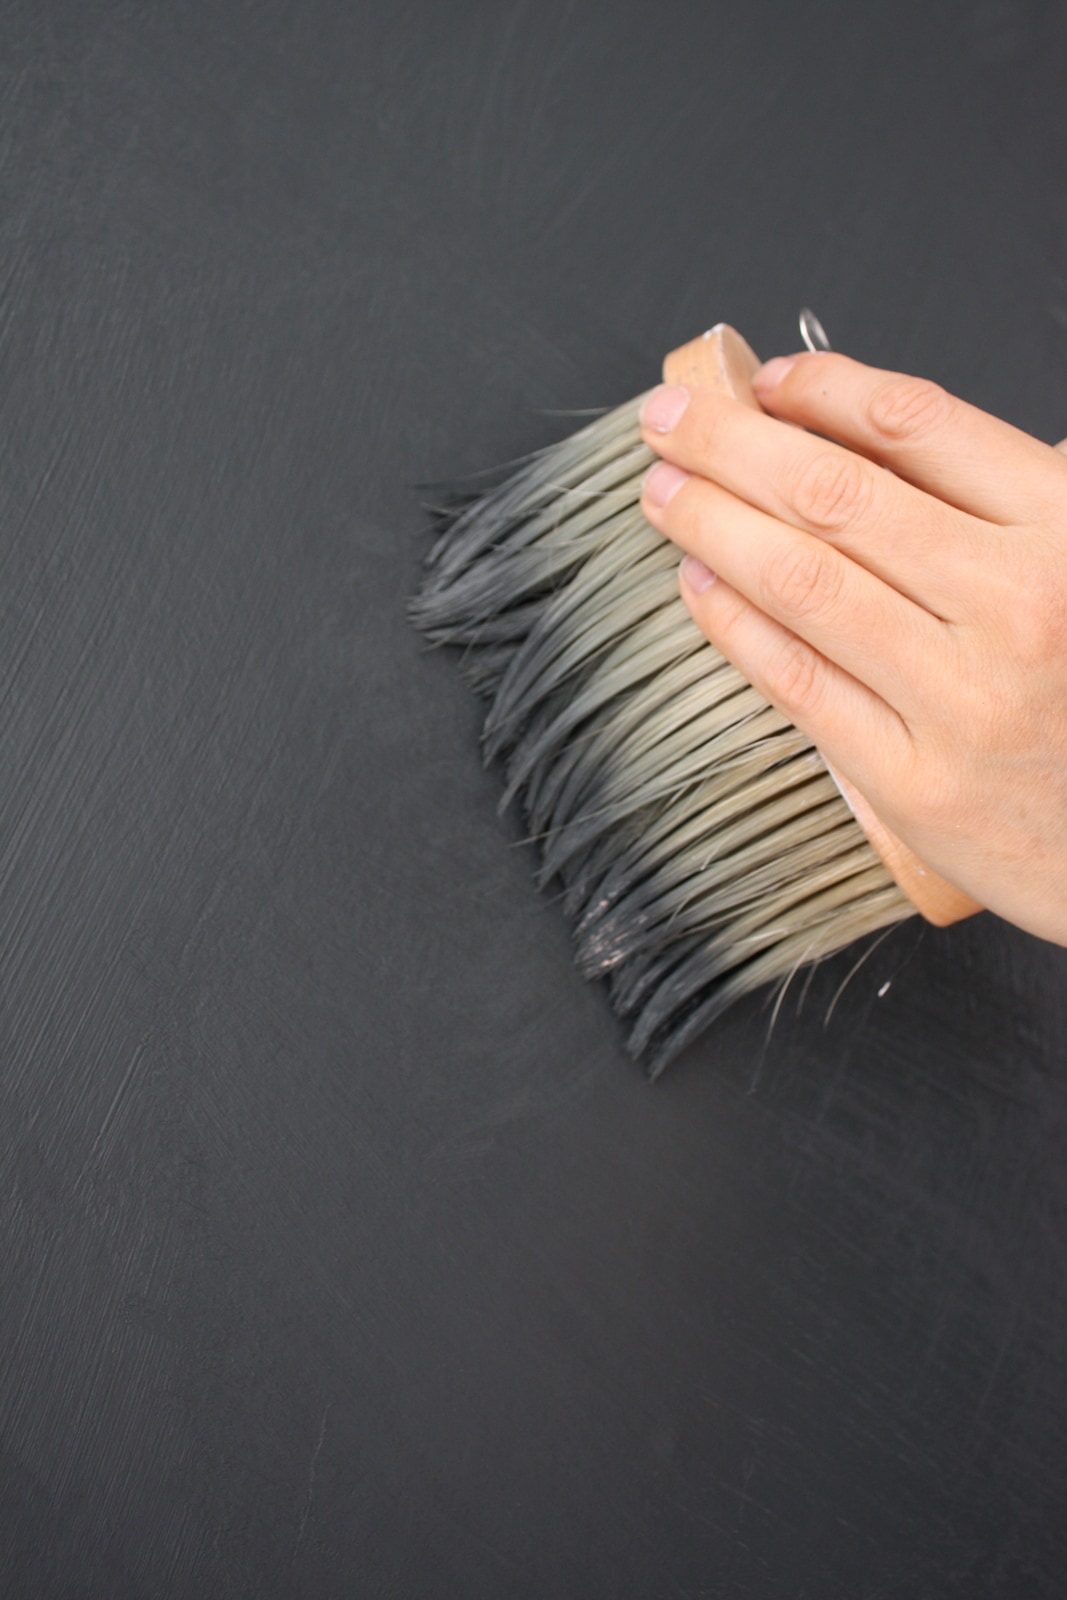 VIA-Kreidefarbe-604-Basalt-streichen | Kreidefarbe Basalt 2500 ml